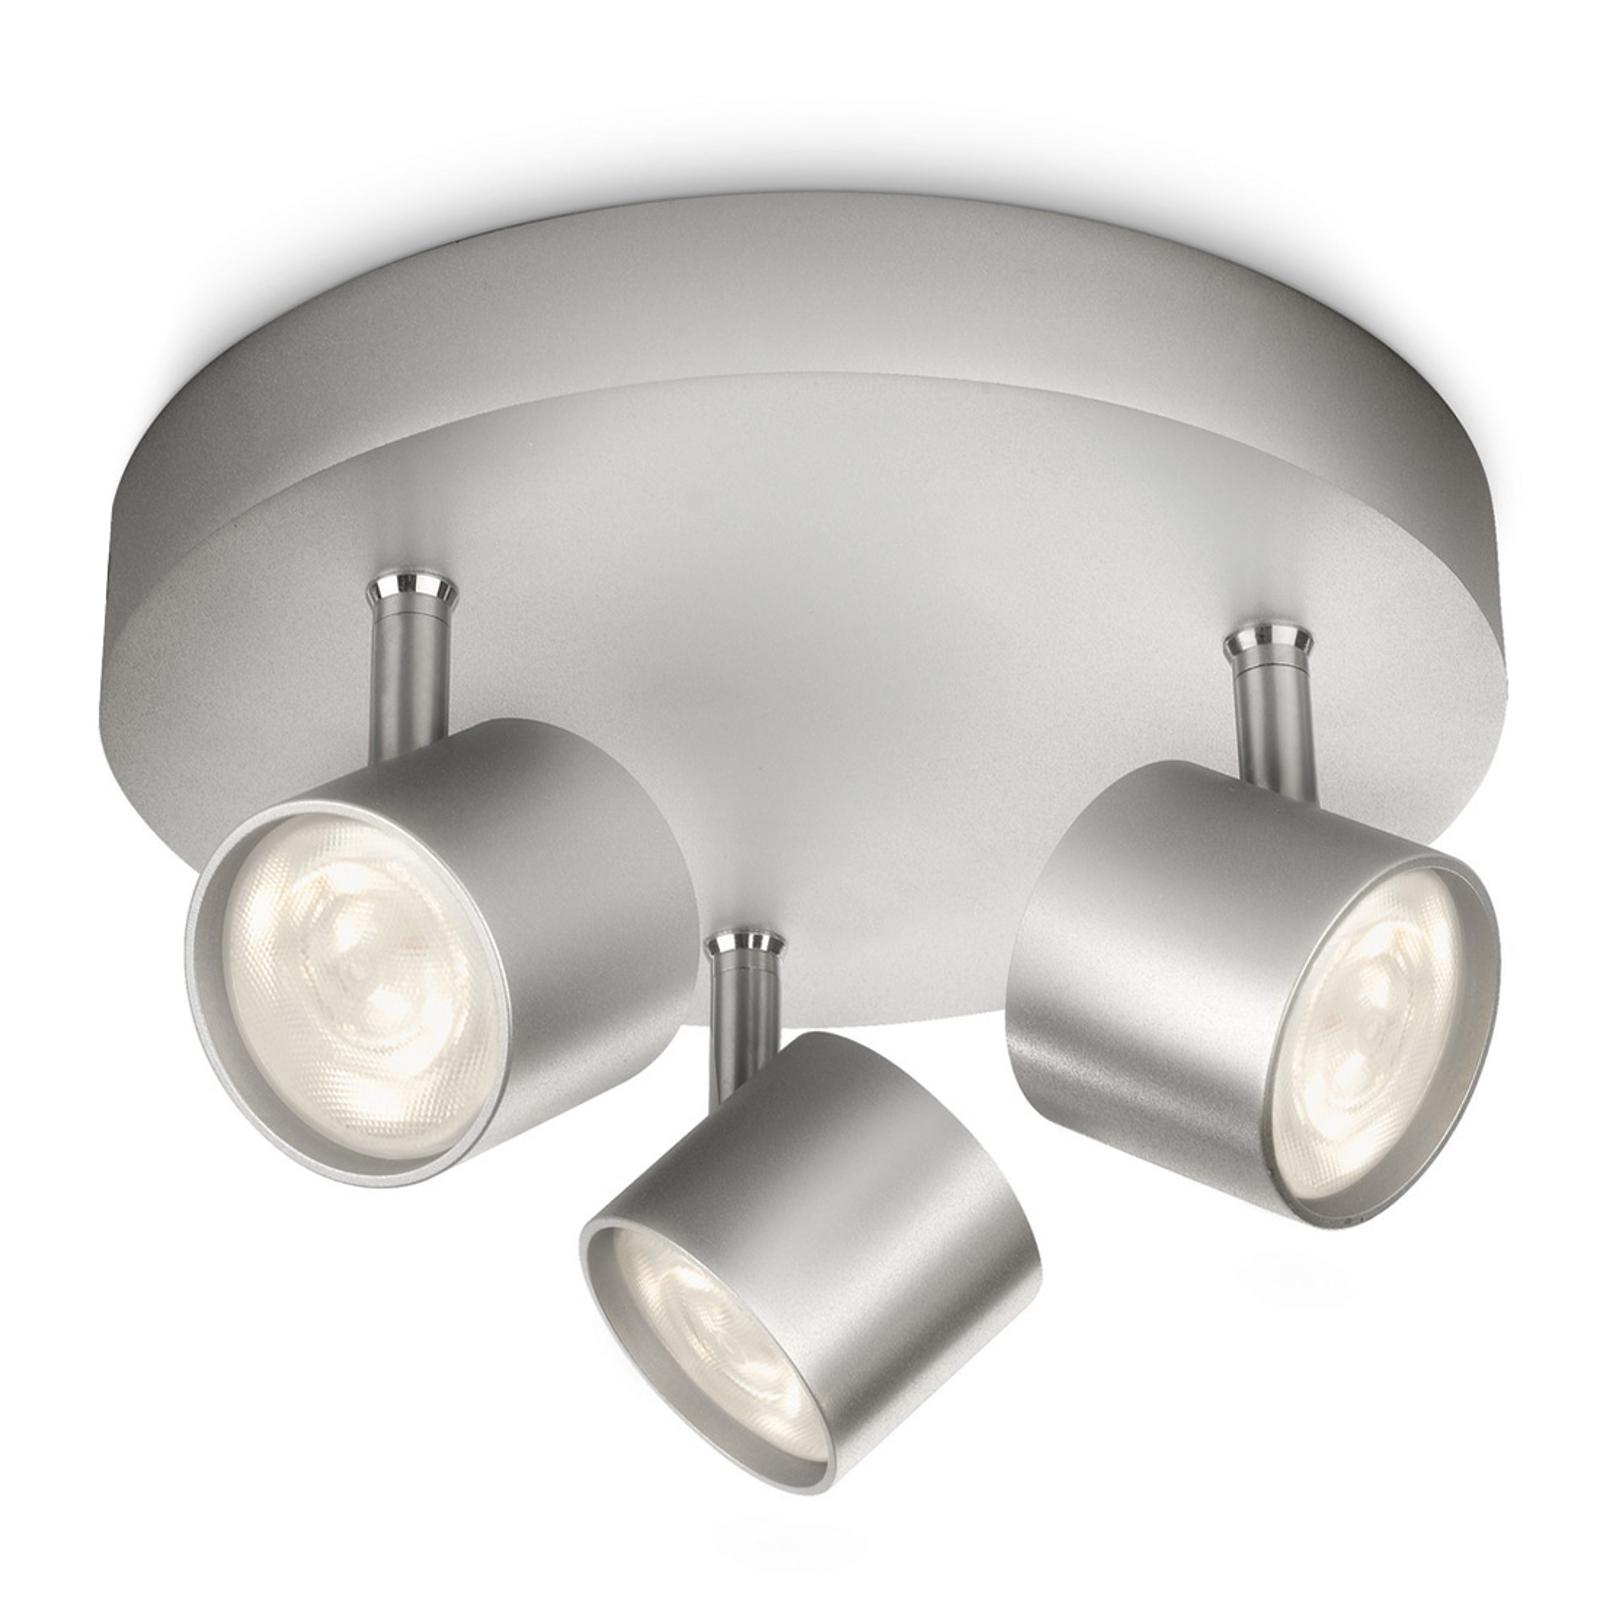 Star rund LED taklampe - 3 flg. stillbar